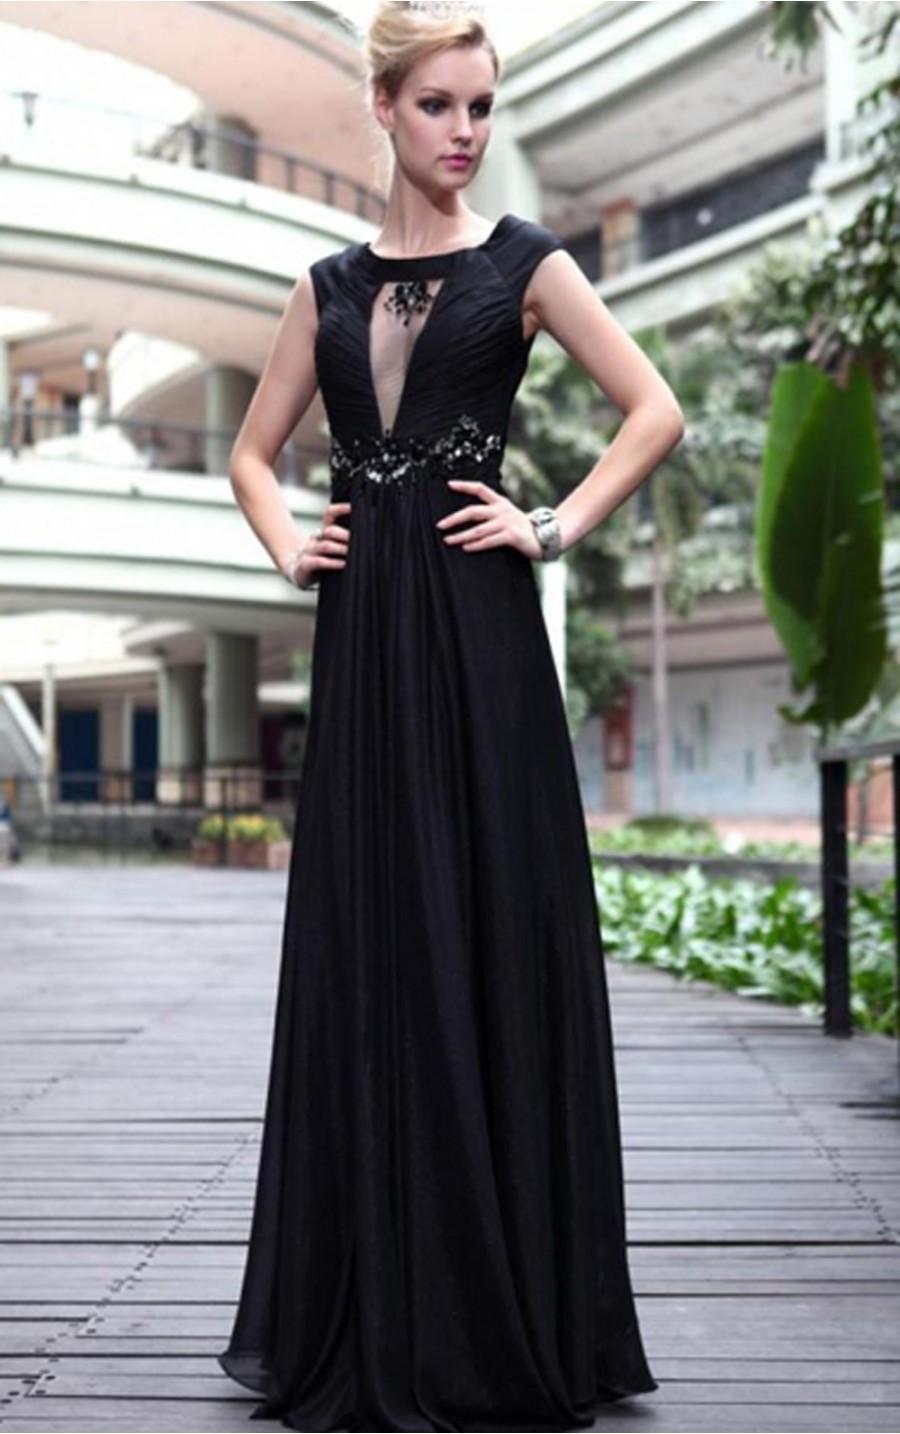 Misses Black Dresses